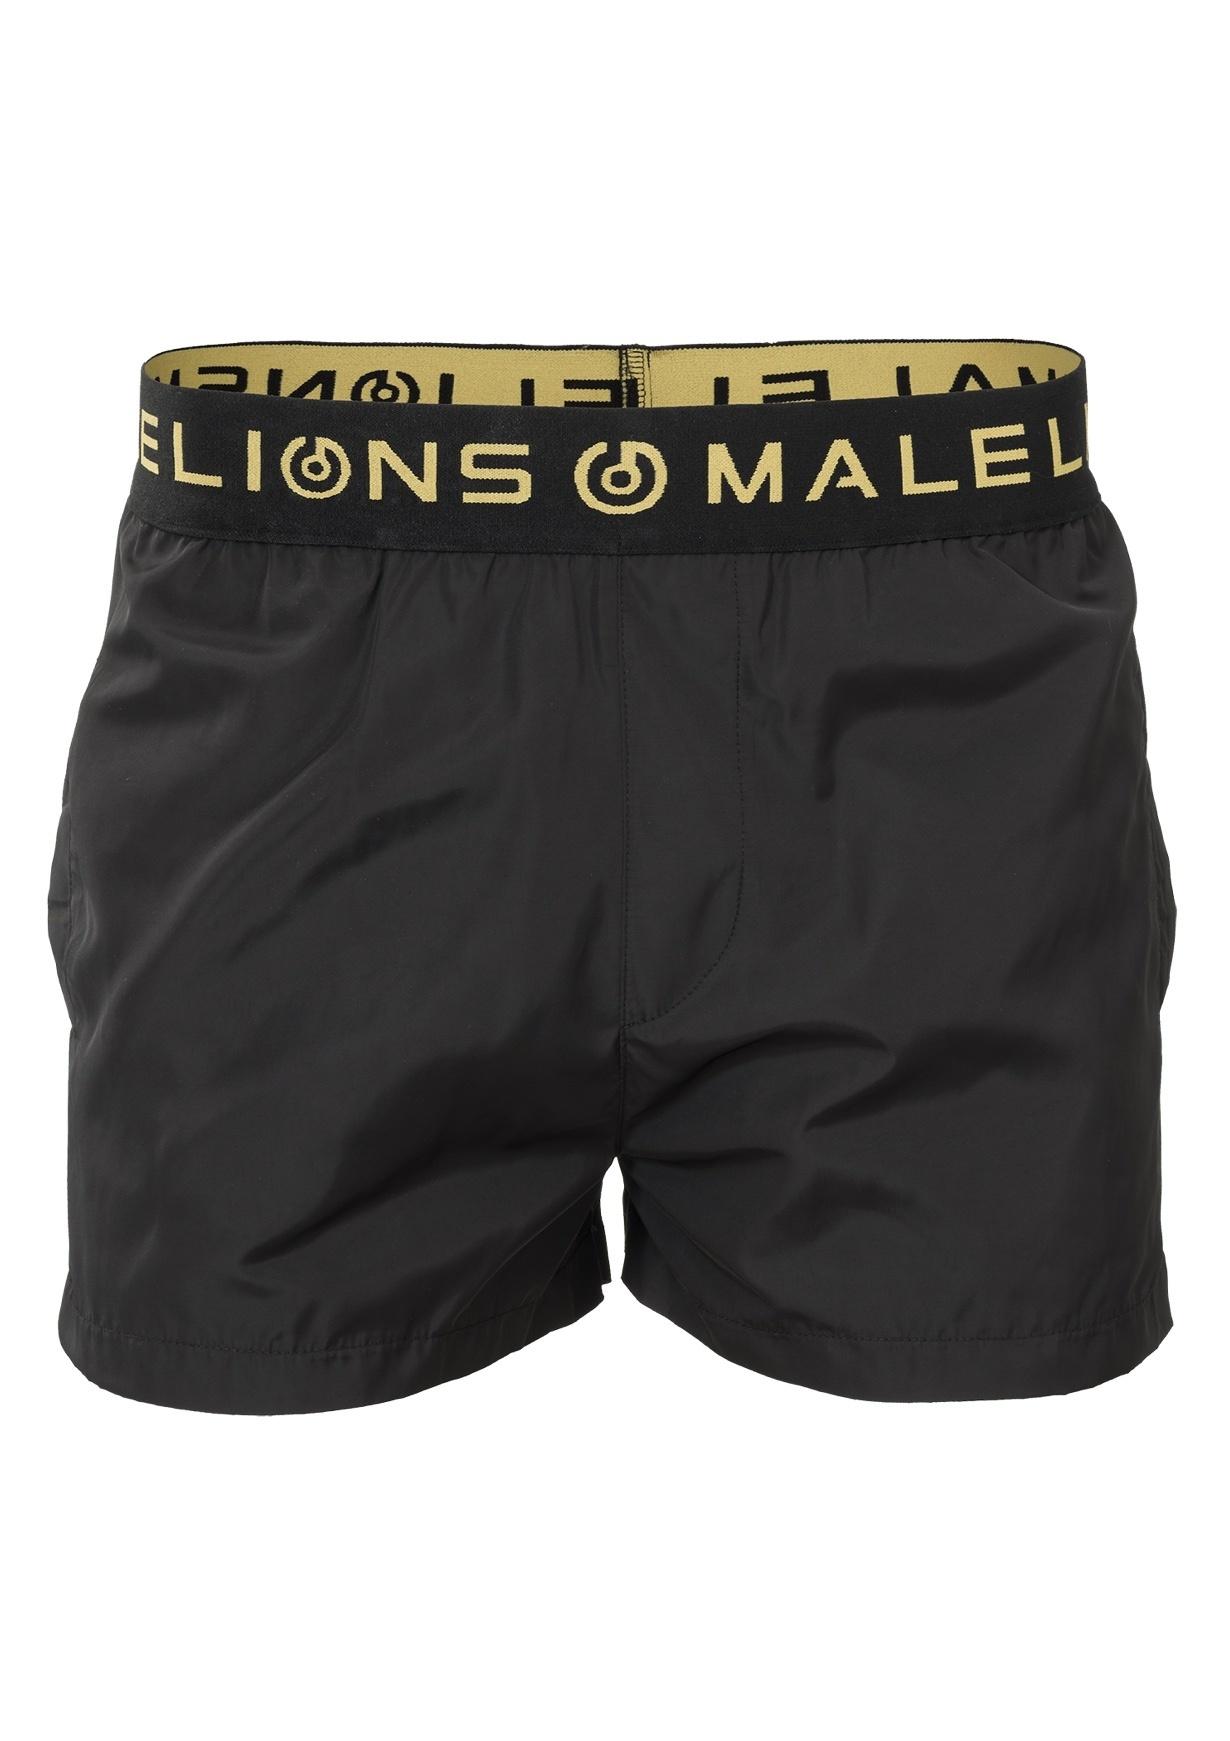 malelions gold black zwembroek